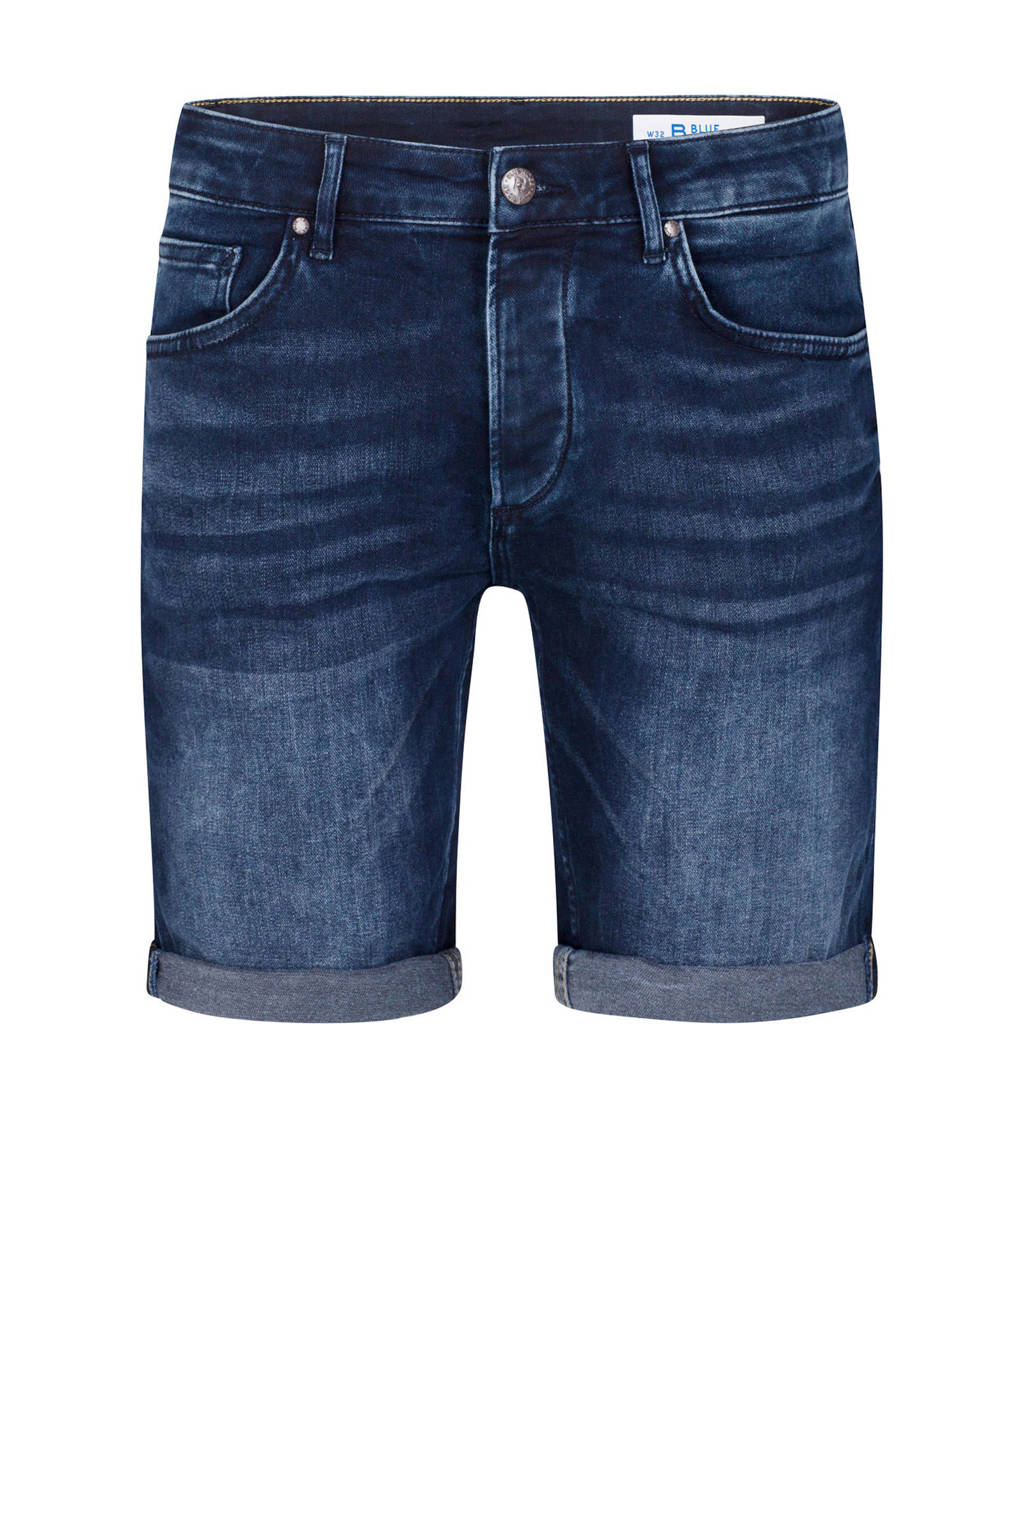 WE Fashion Blue Ridge regular fit jeans short Renz Rex, Blue black